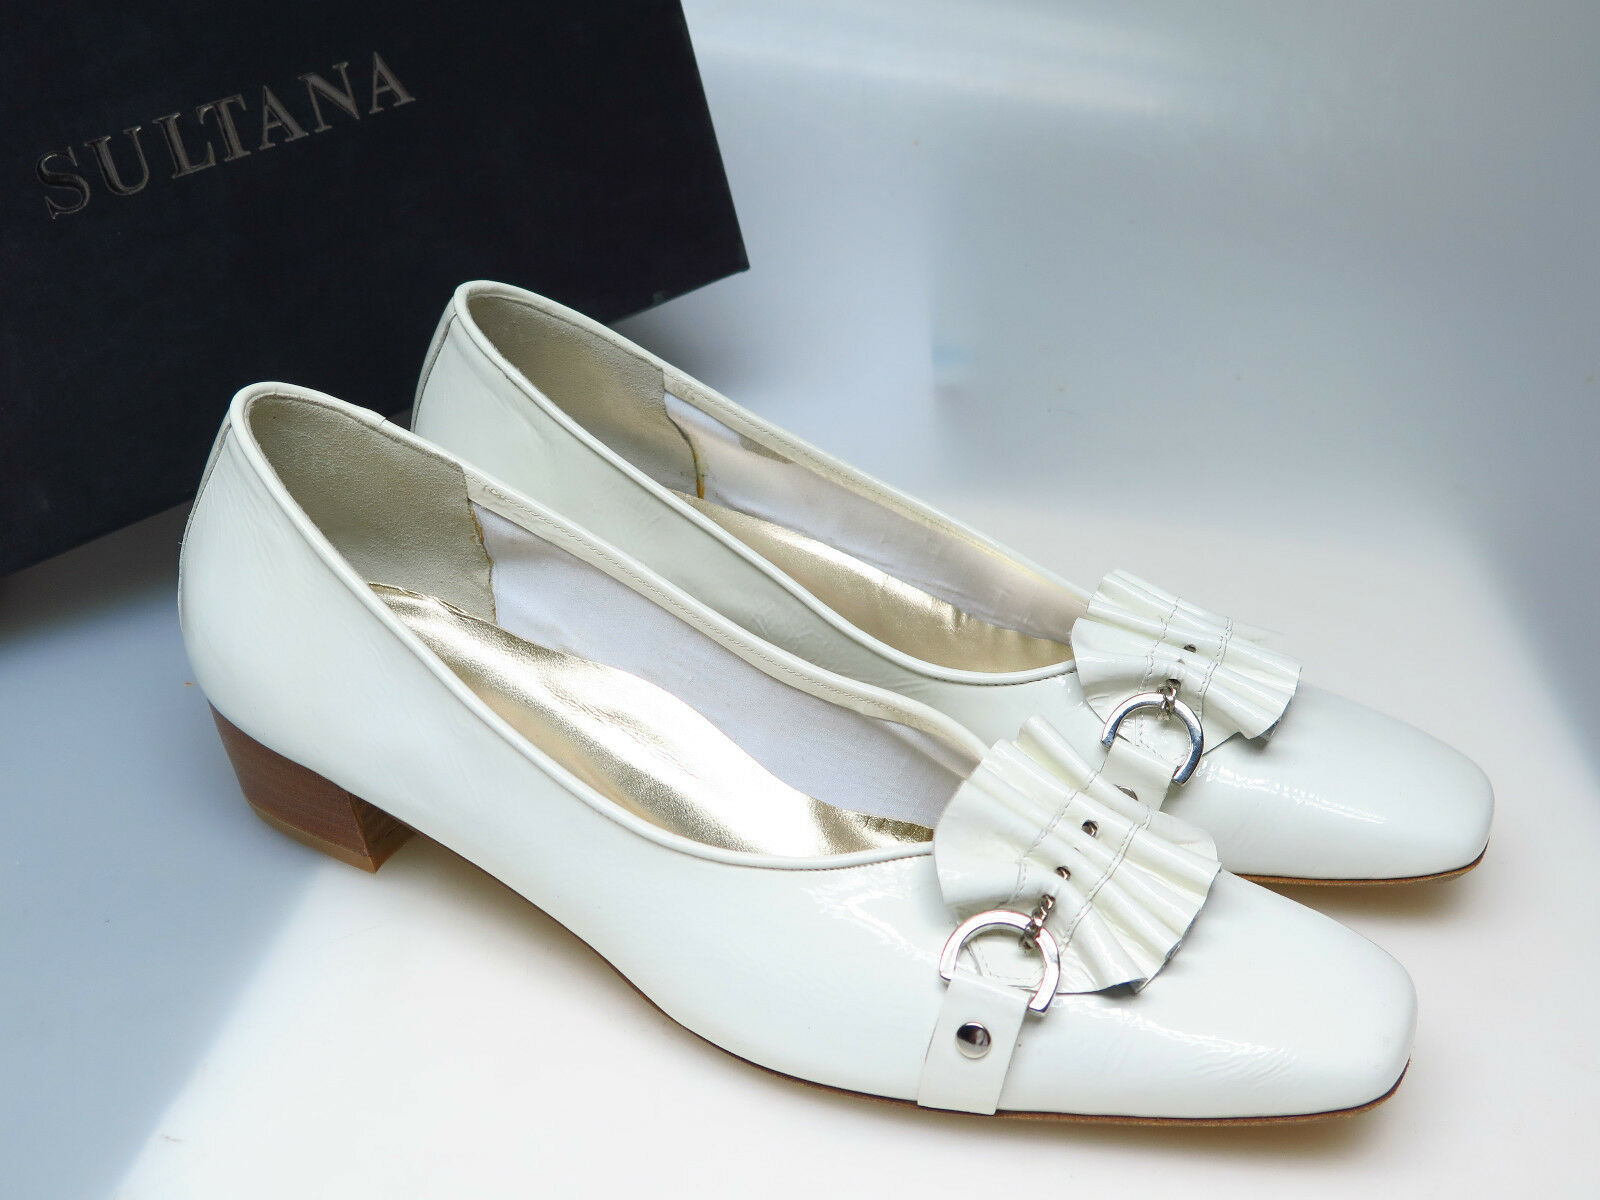 SULTANA Schuhe Designer Damenschuhe N1917 Lucy Lara Naplak Bianco Gr 41,5 NEU